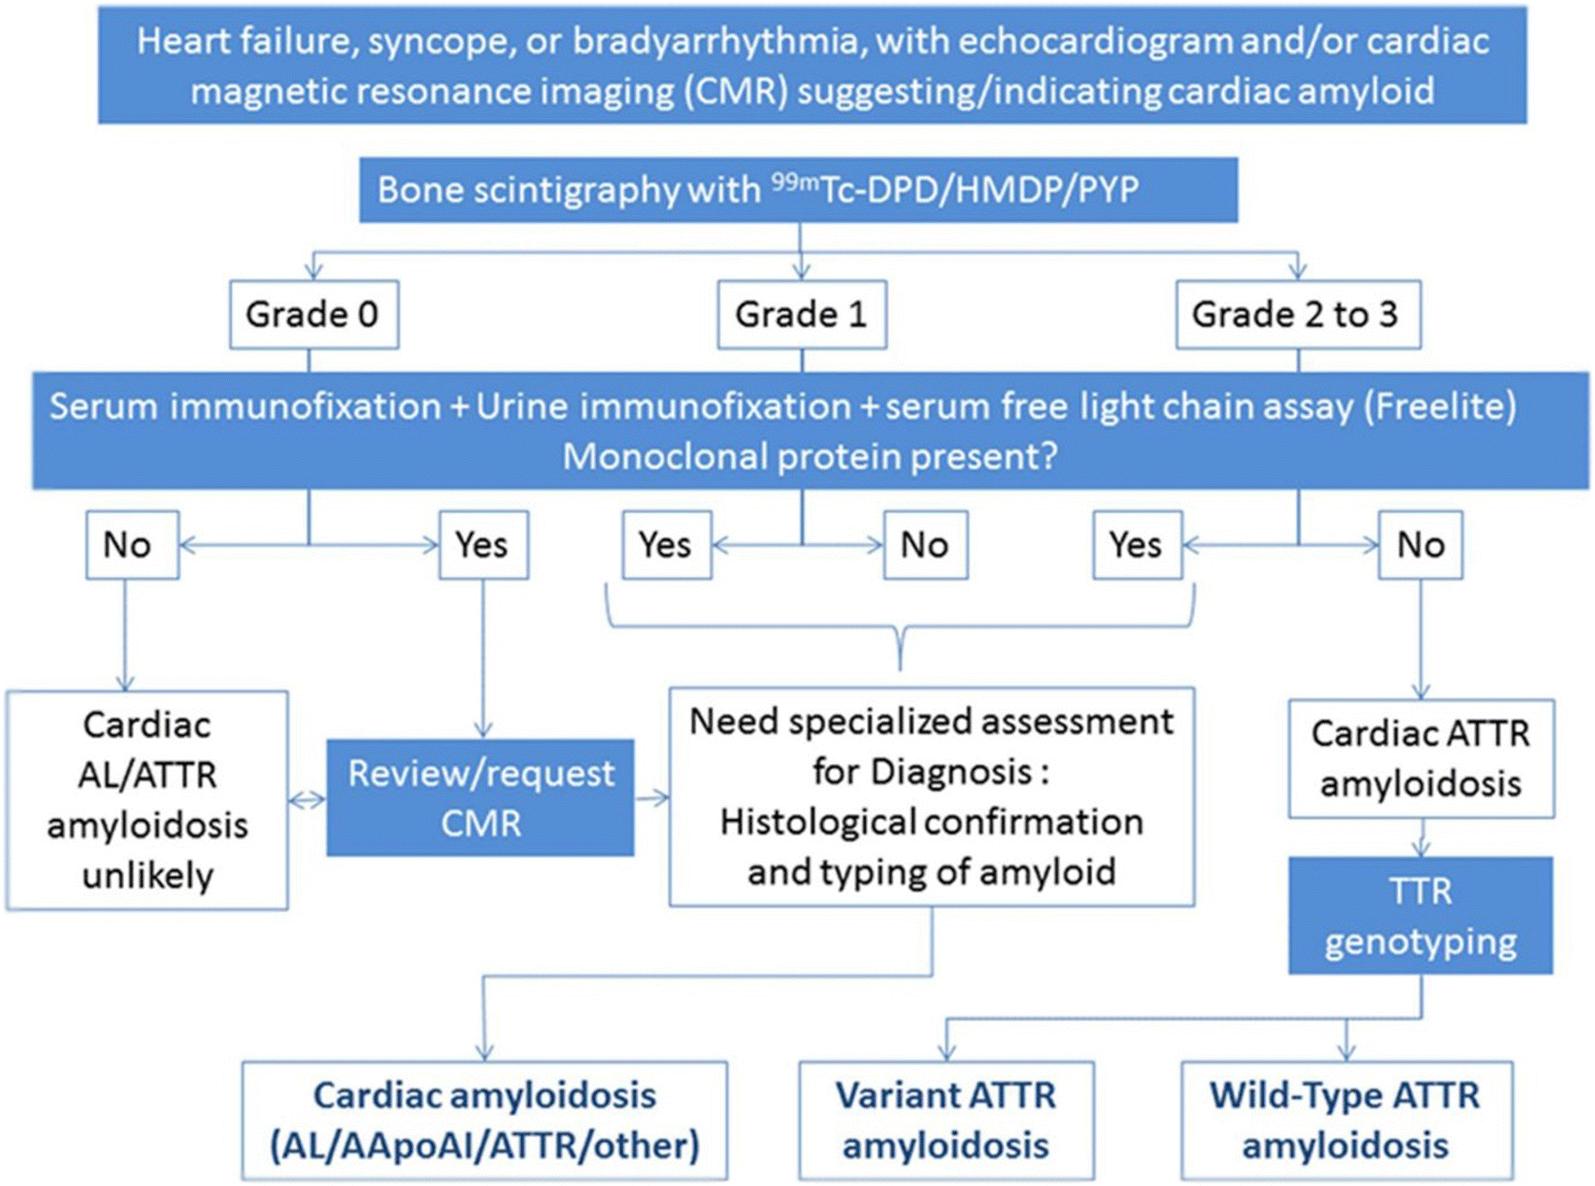 ASNC/AHA/ASE/EANM/HFSA/ISA/SCMR/SNMMI expert consensus